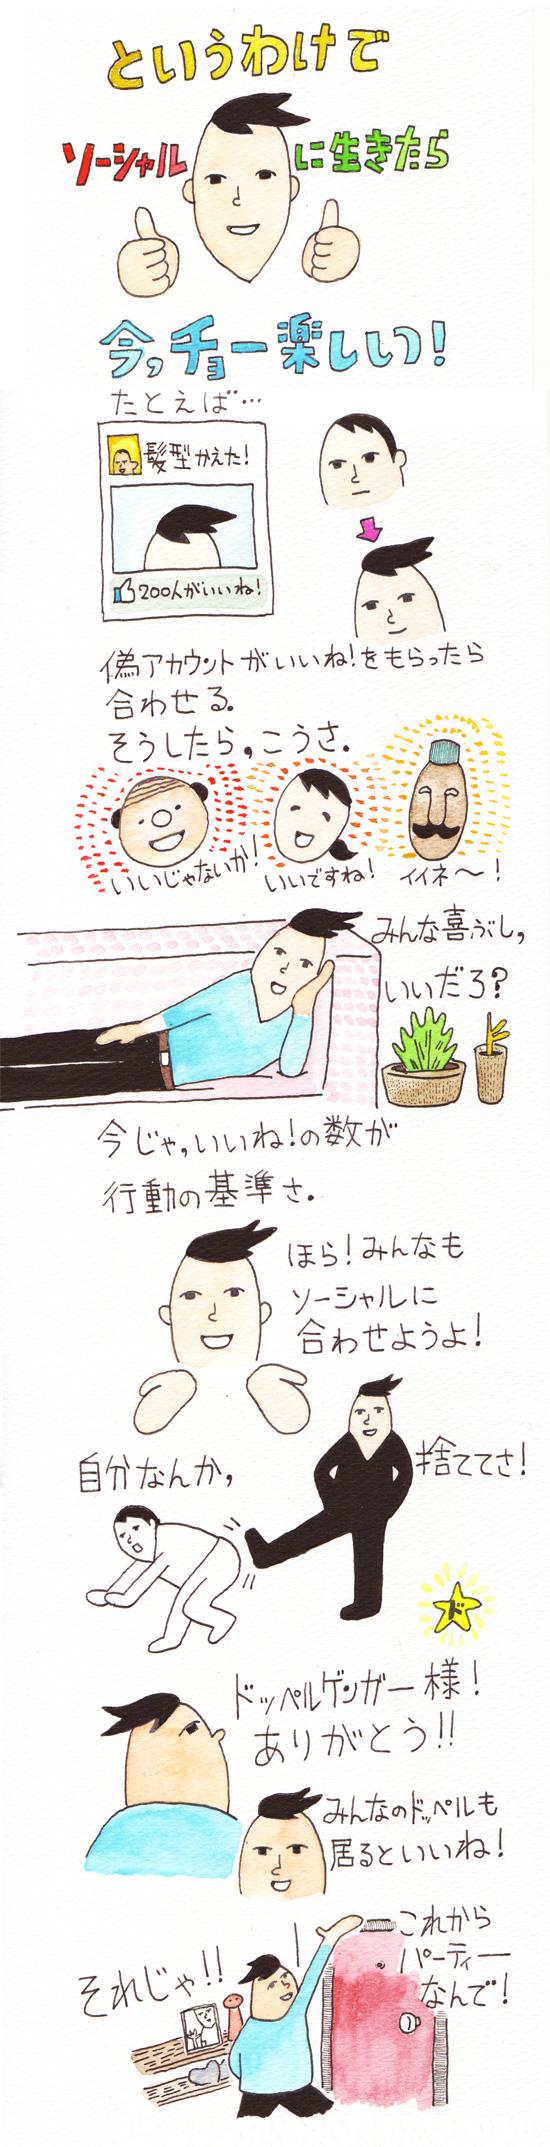 20120823_43769